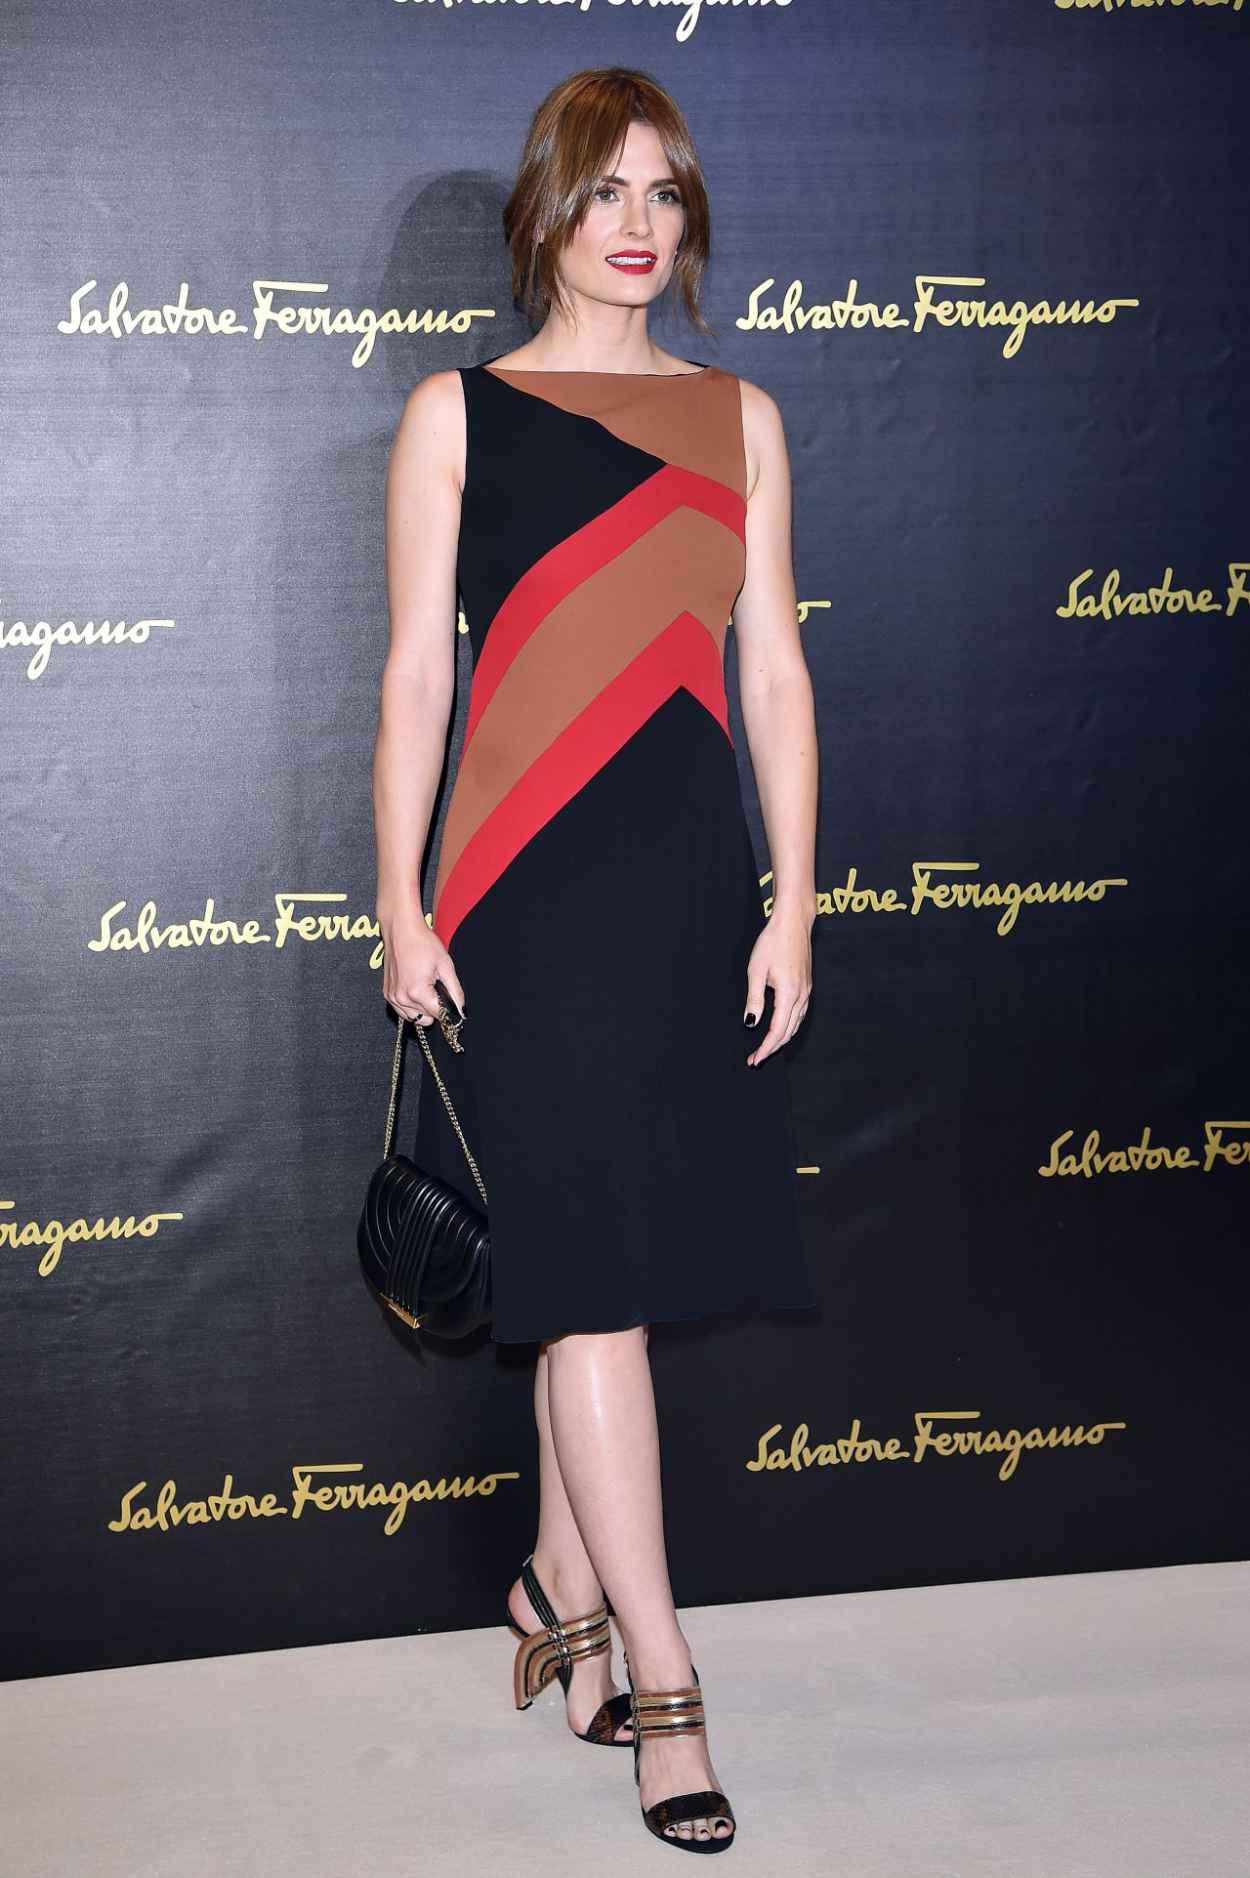 Stana Katic - Salvatore Ferragamo - Milan Fashion Week SS16-2